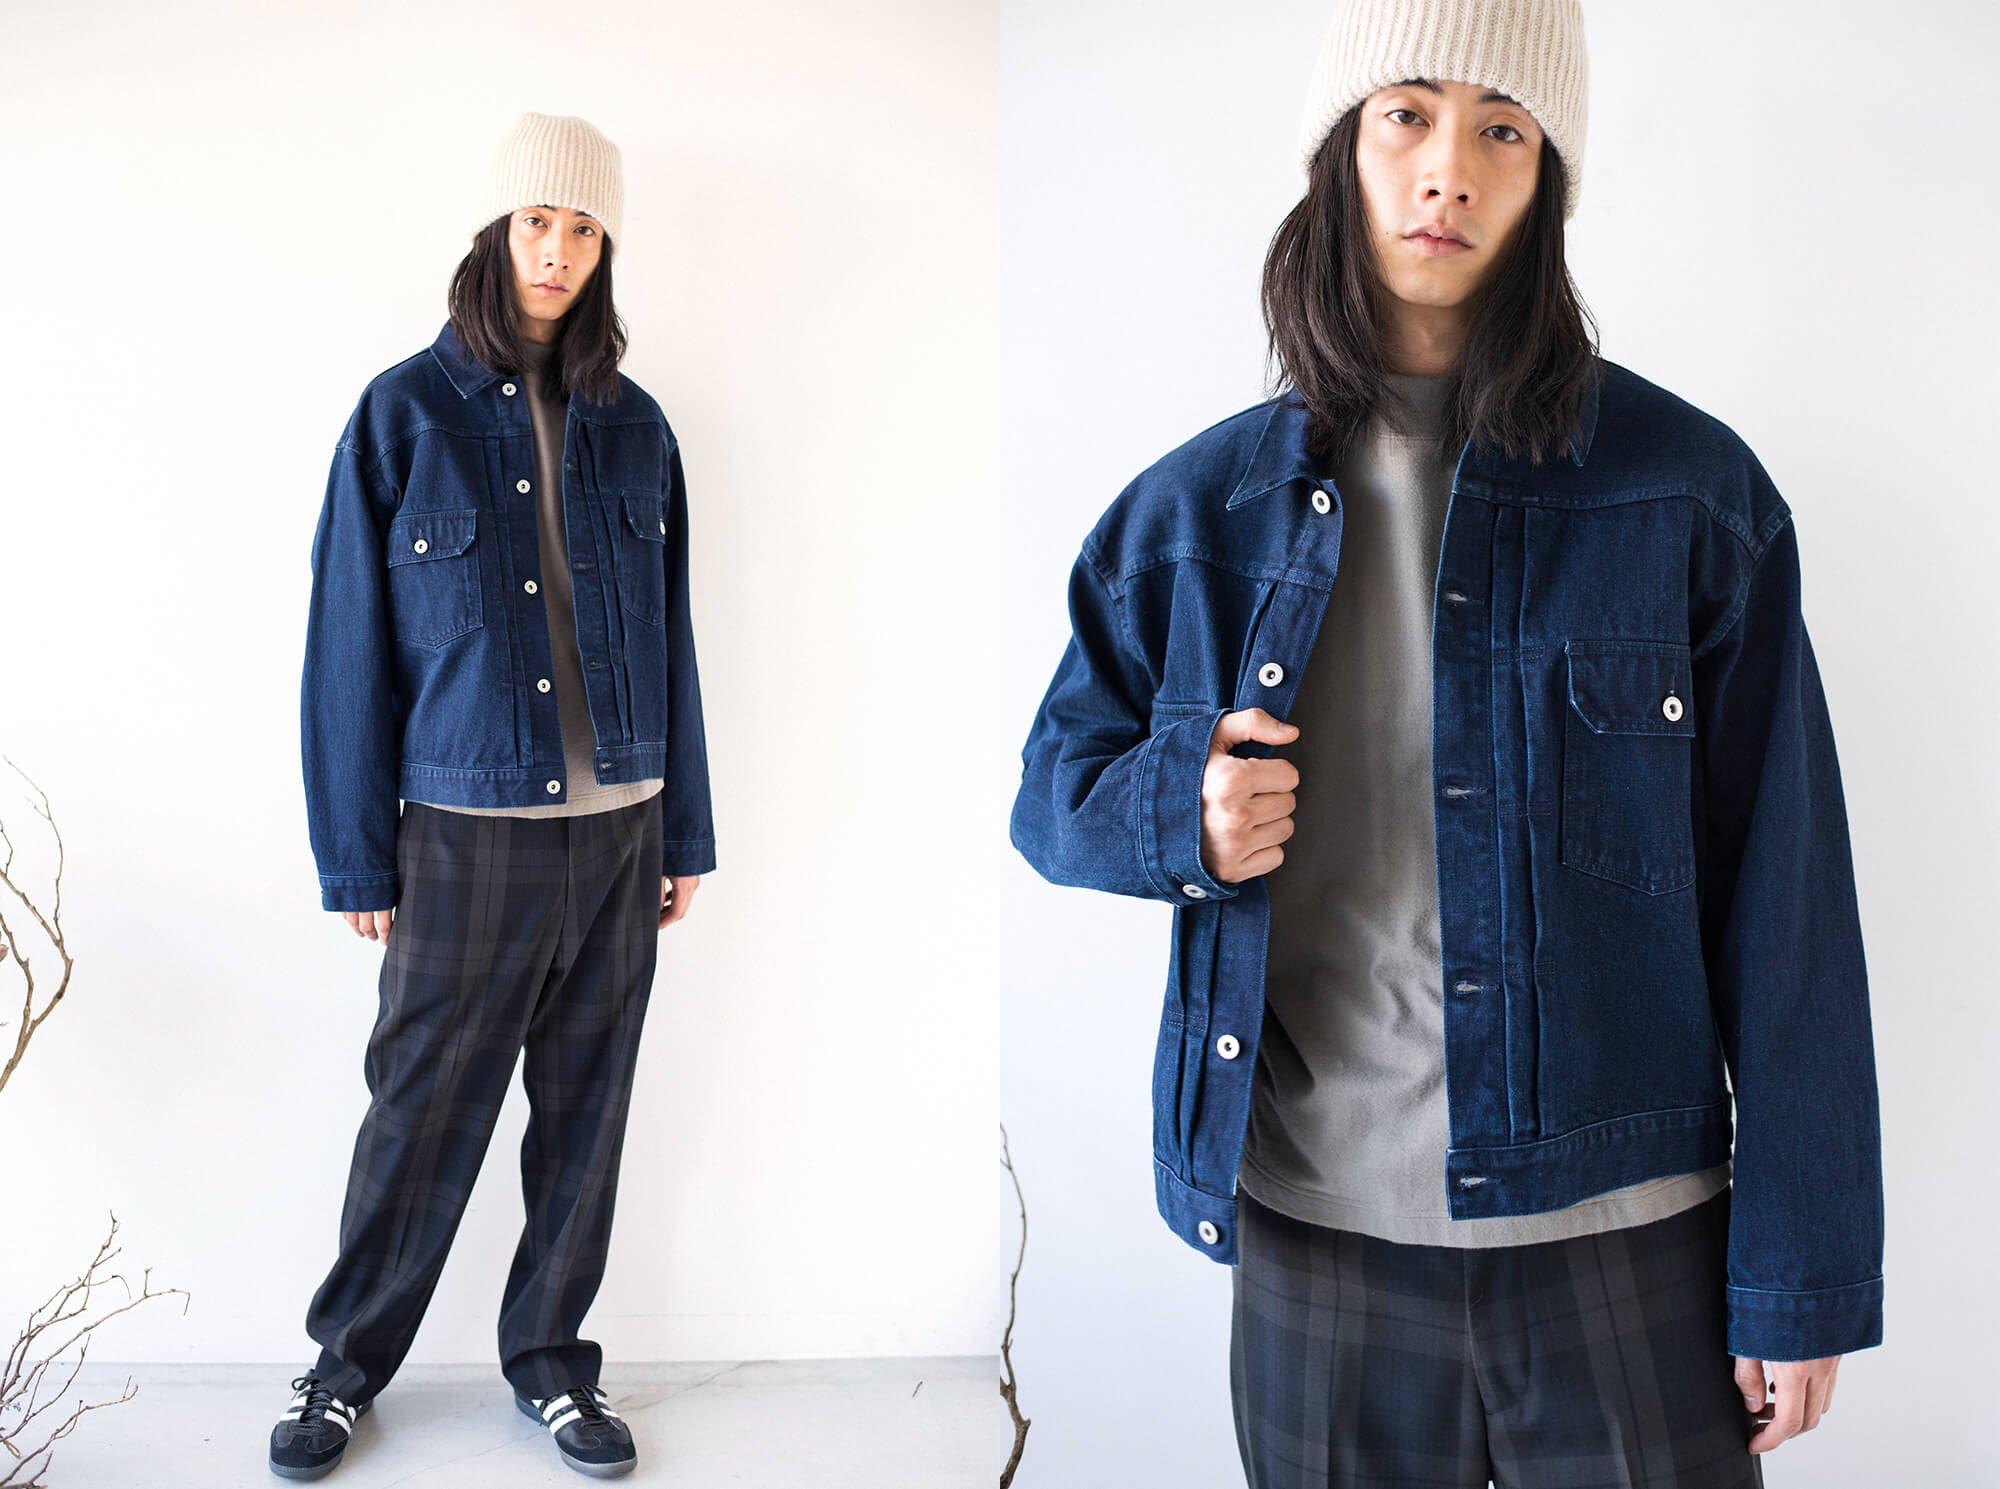 14oz organic cotton denim jacket